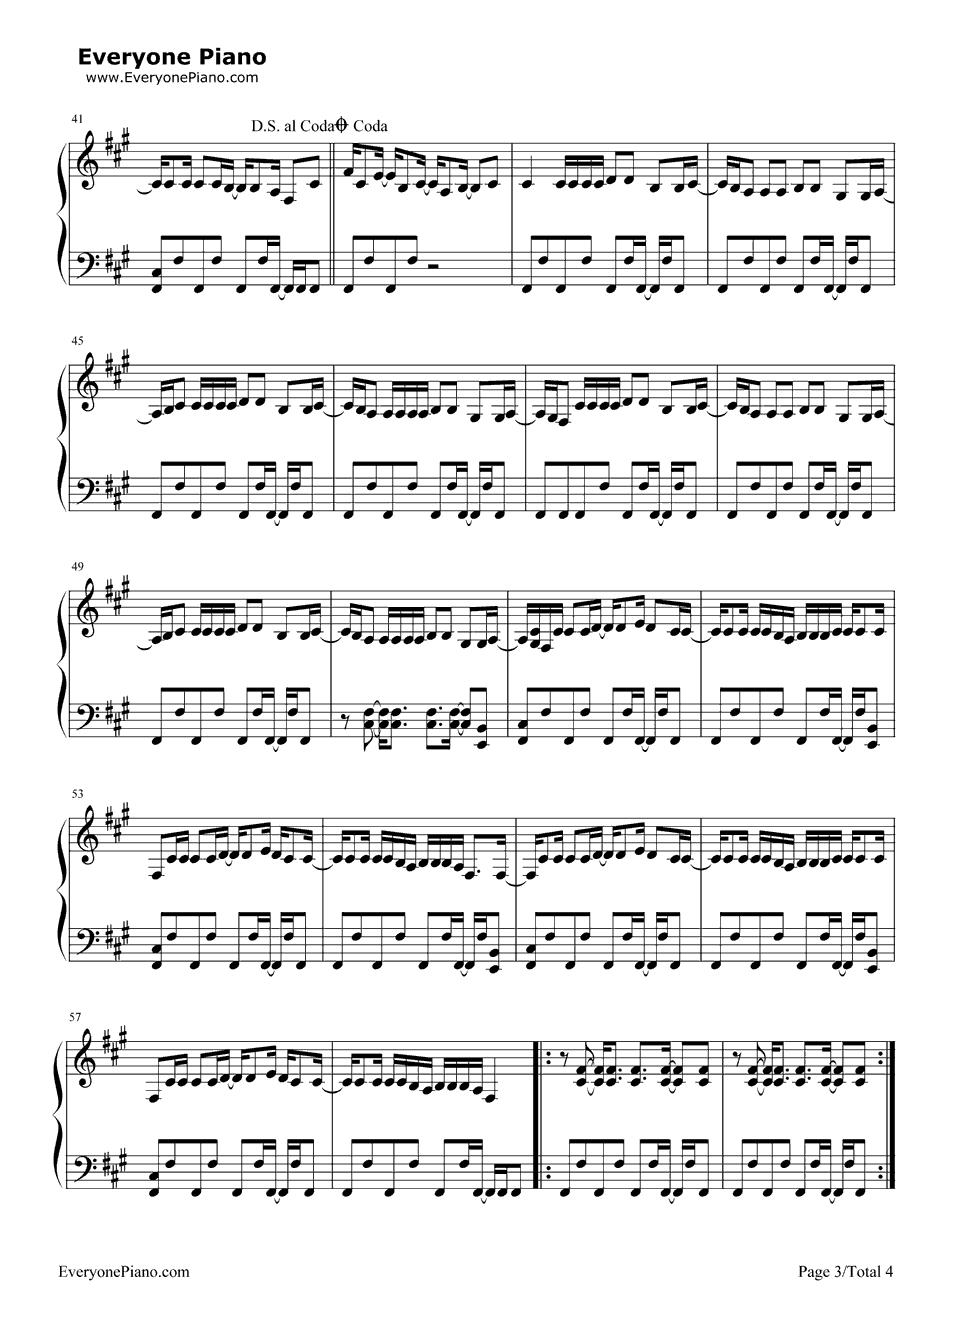 Pon de replay rihanna stave preview 3 free piano sheet music listen now print sheet pon de replay rihanna stave preview 3 hexwebz Image collections